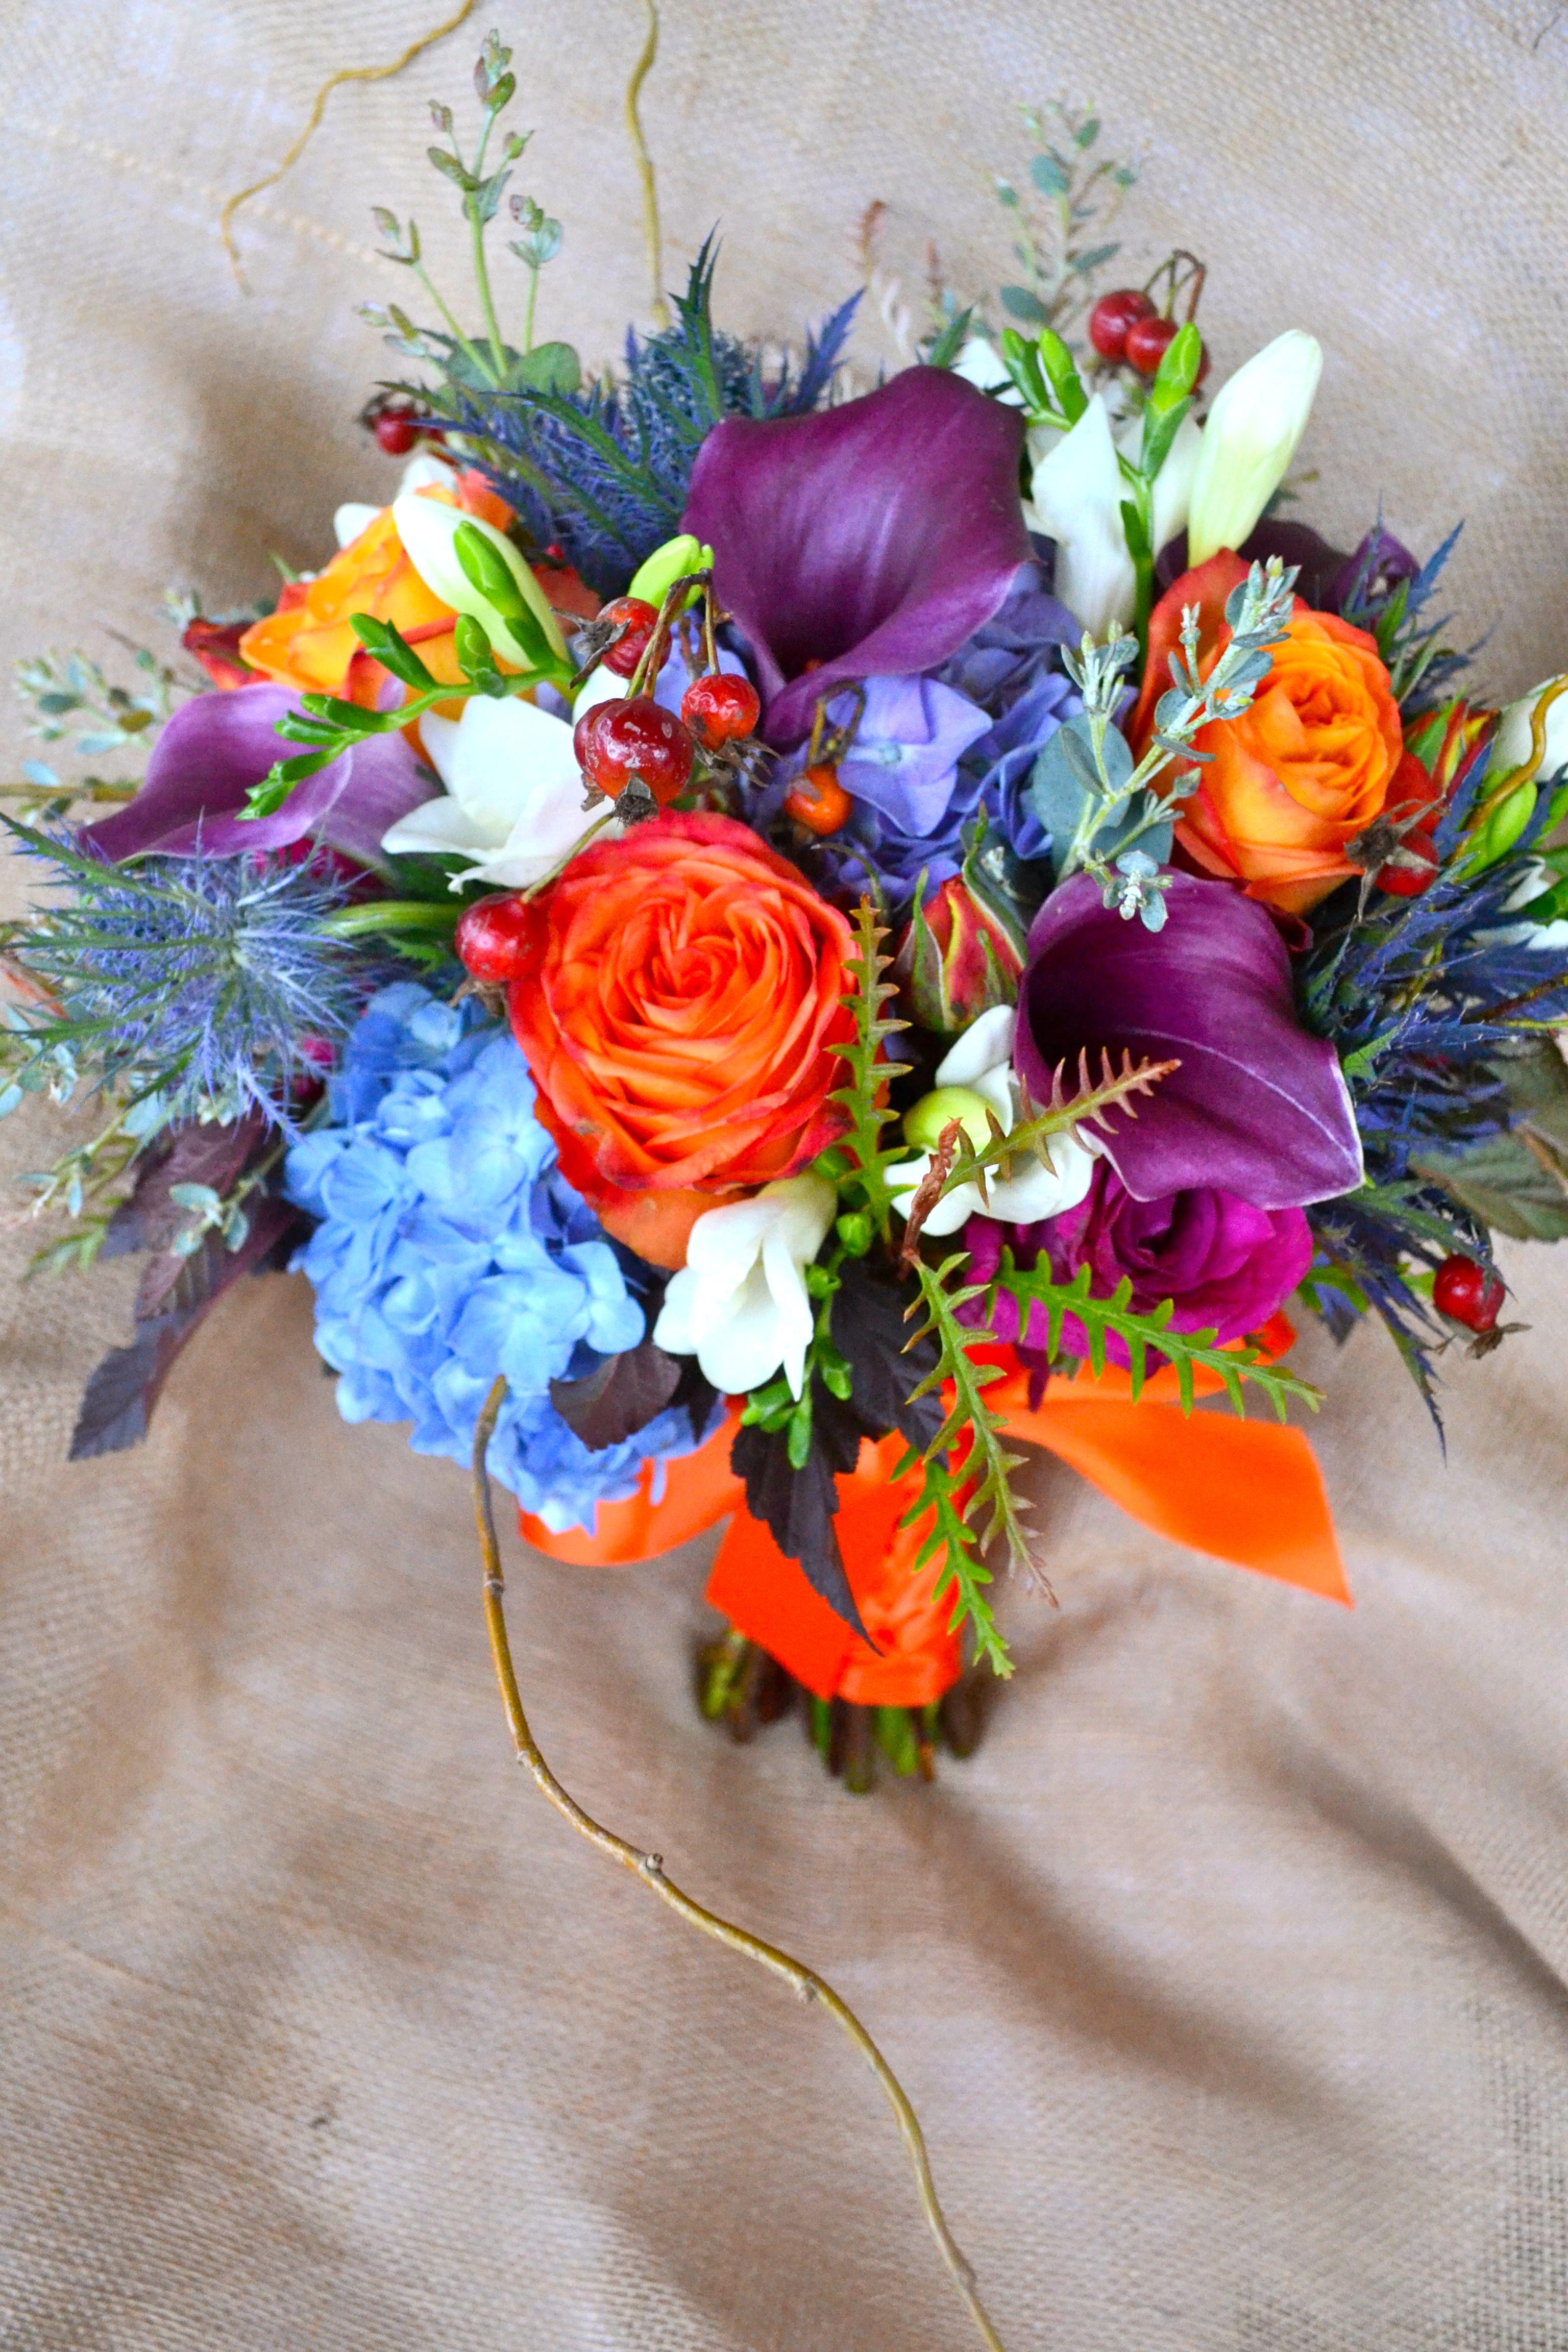 Purple Flowers For October Wedding : October wedding althauser design